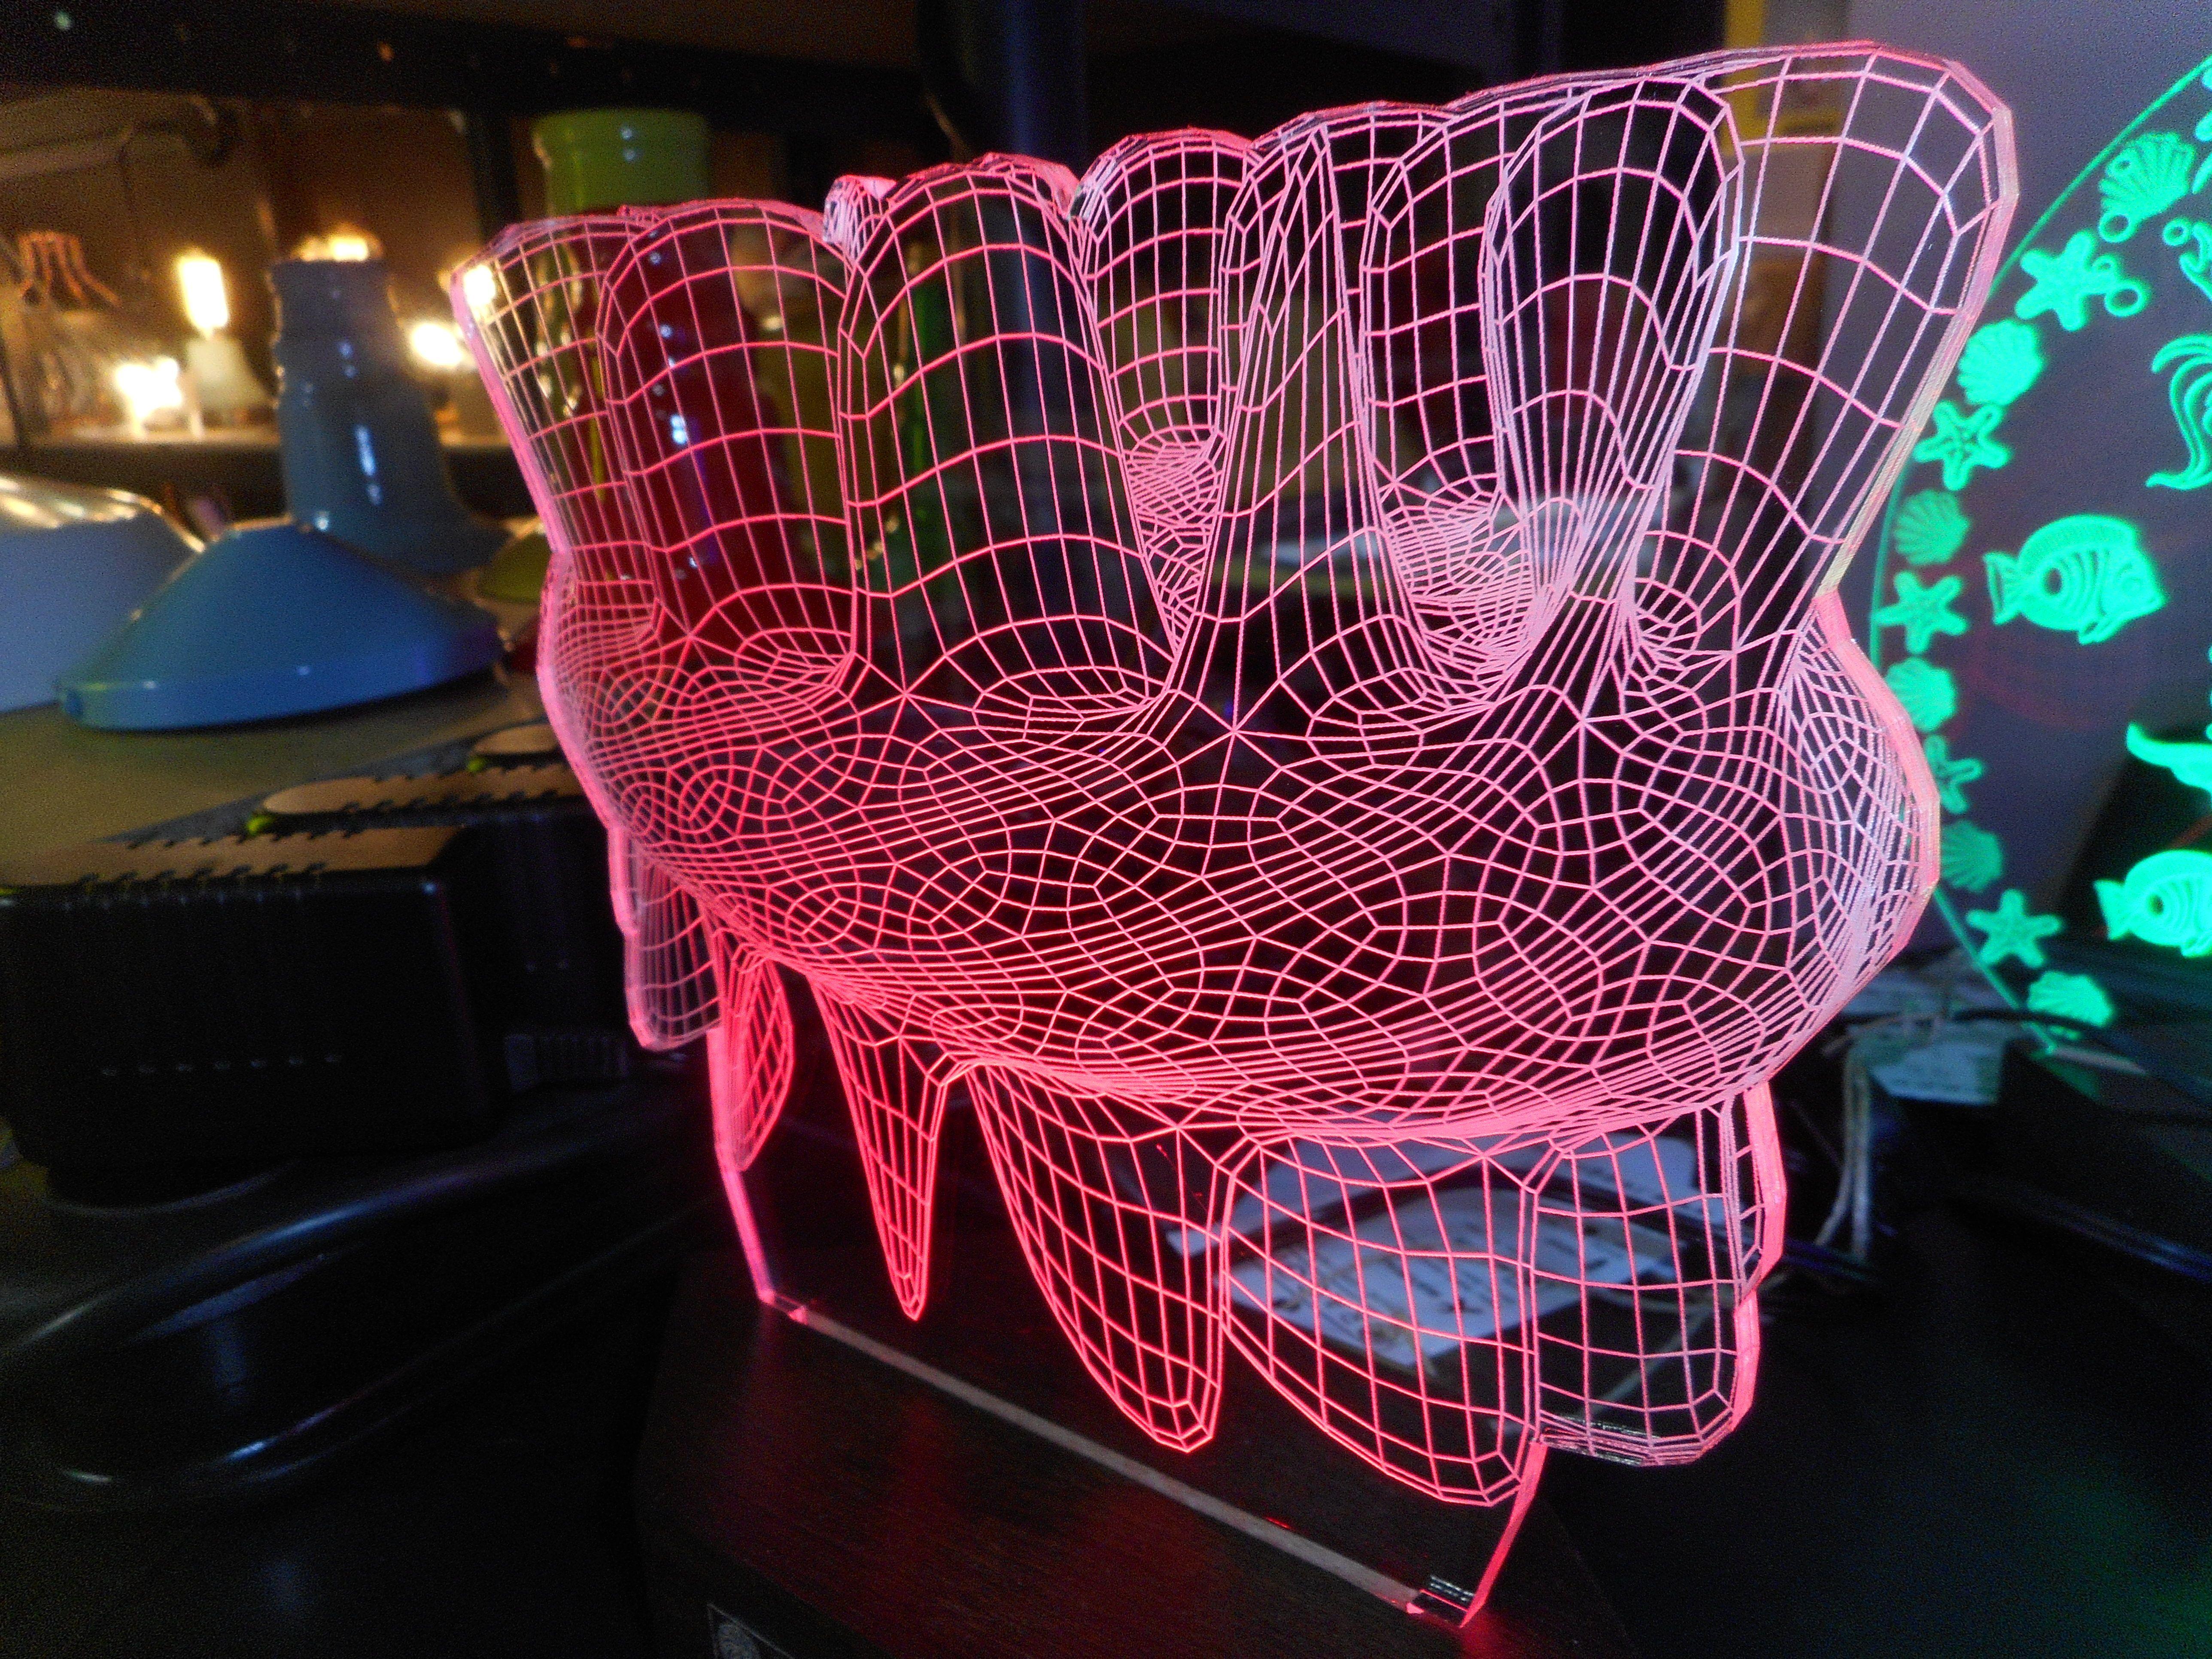 Led night light kickstarter - Night Light Laser Engraved Acrylic Led Lamp Decoration 3d From Raggio Eu